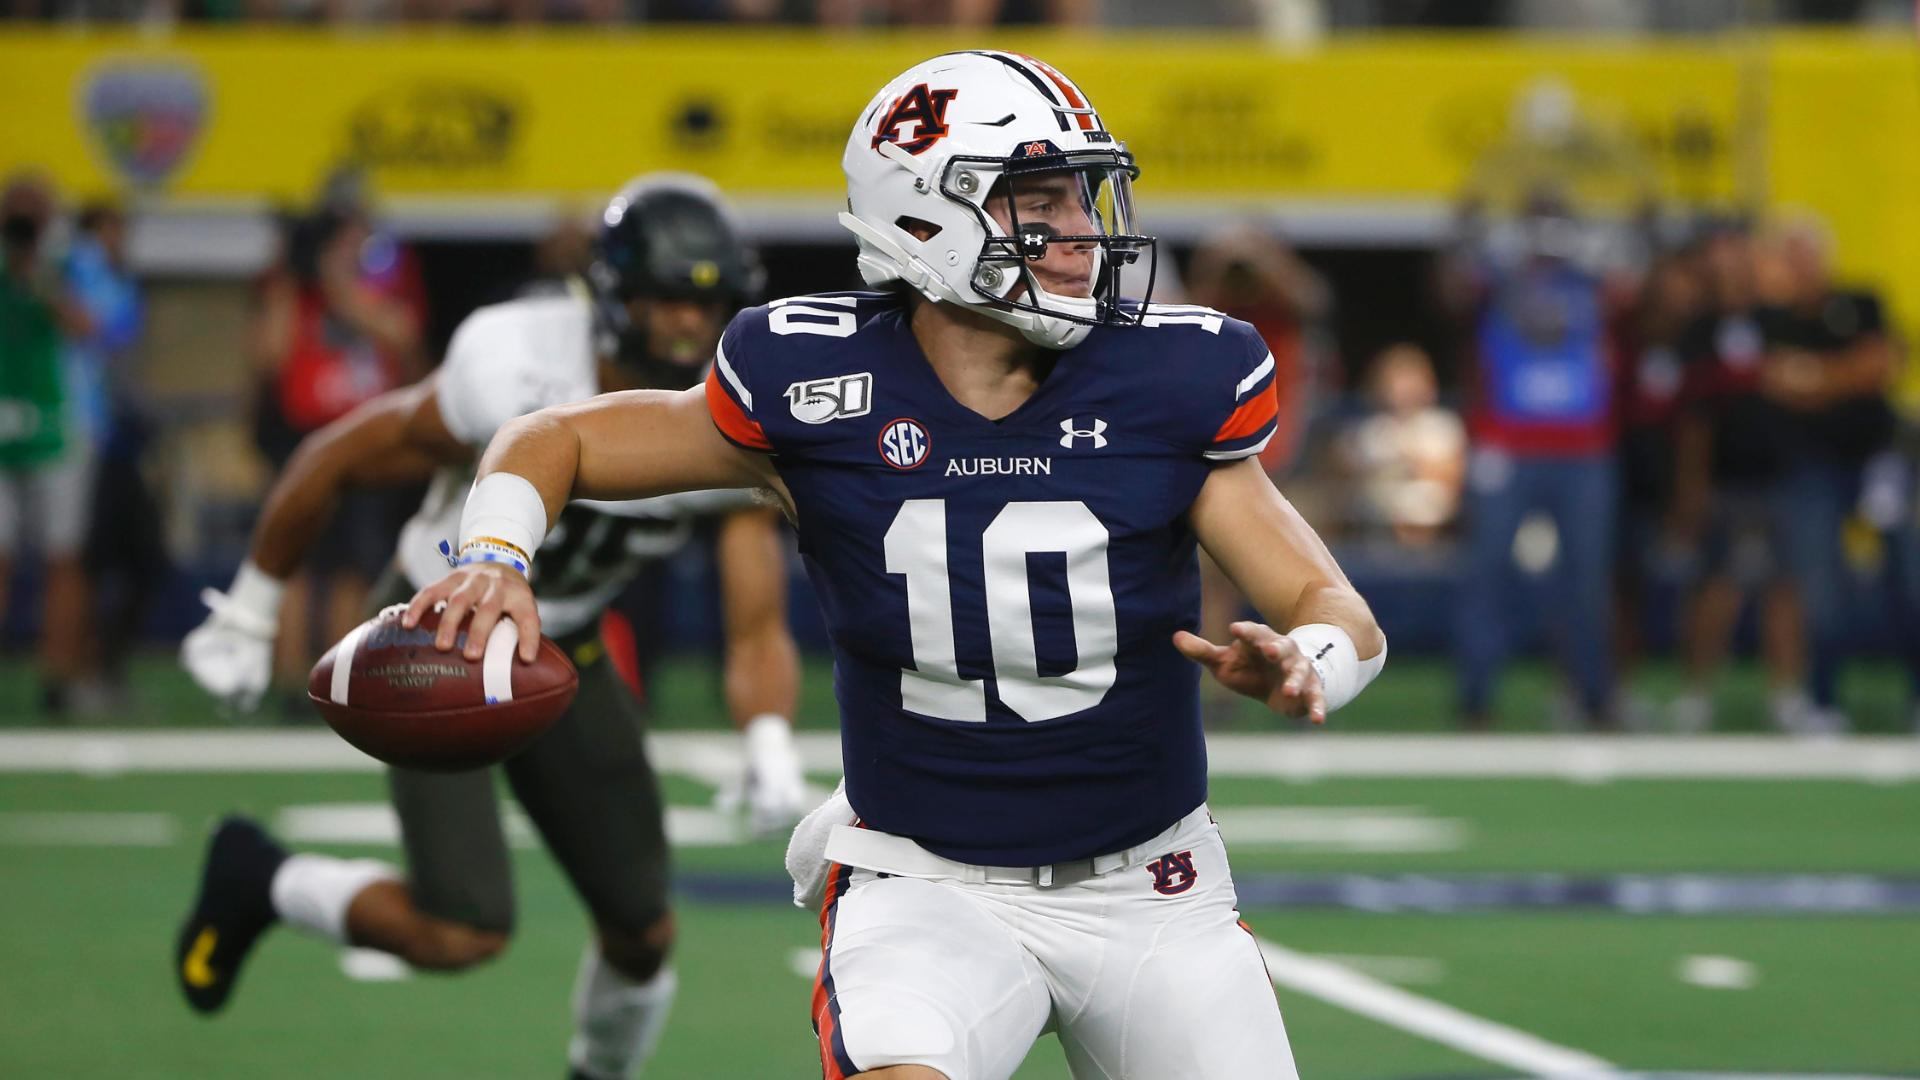 Nix's heroics lead to Auburn's comeback win over Oregon